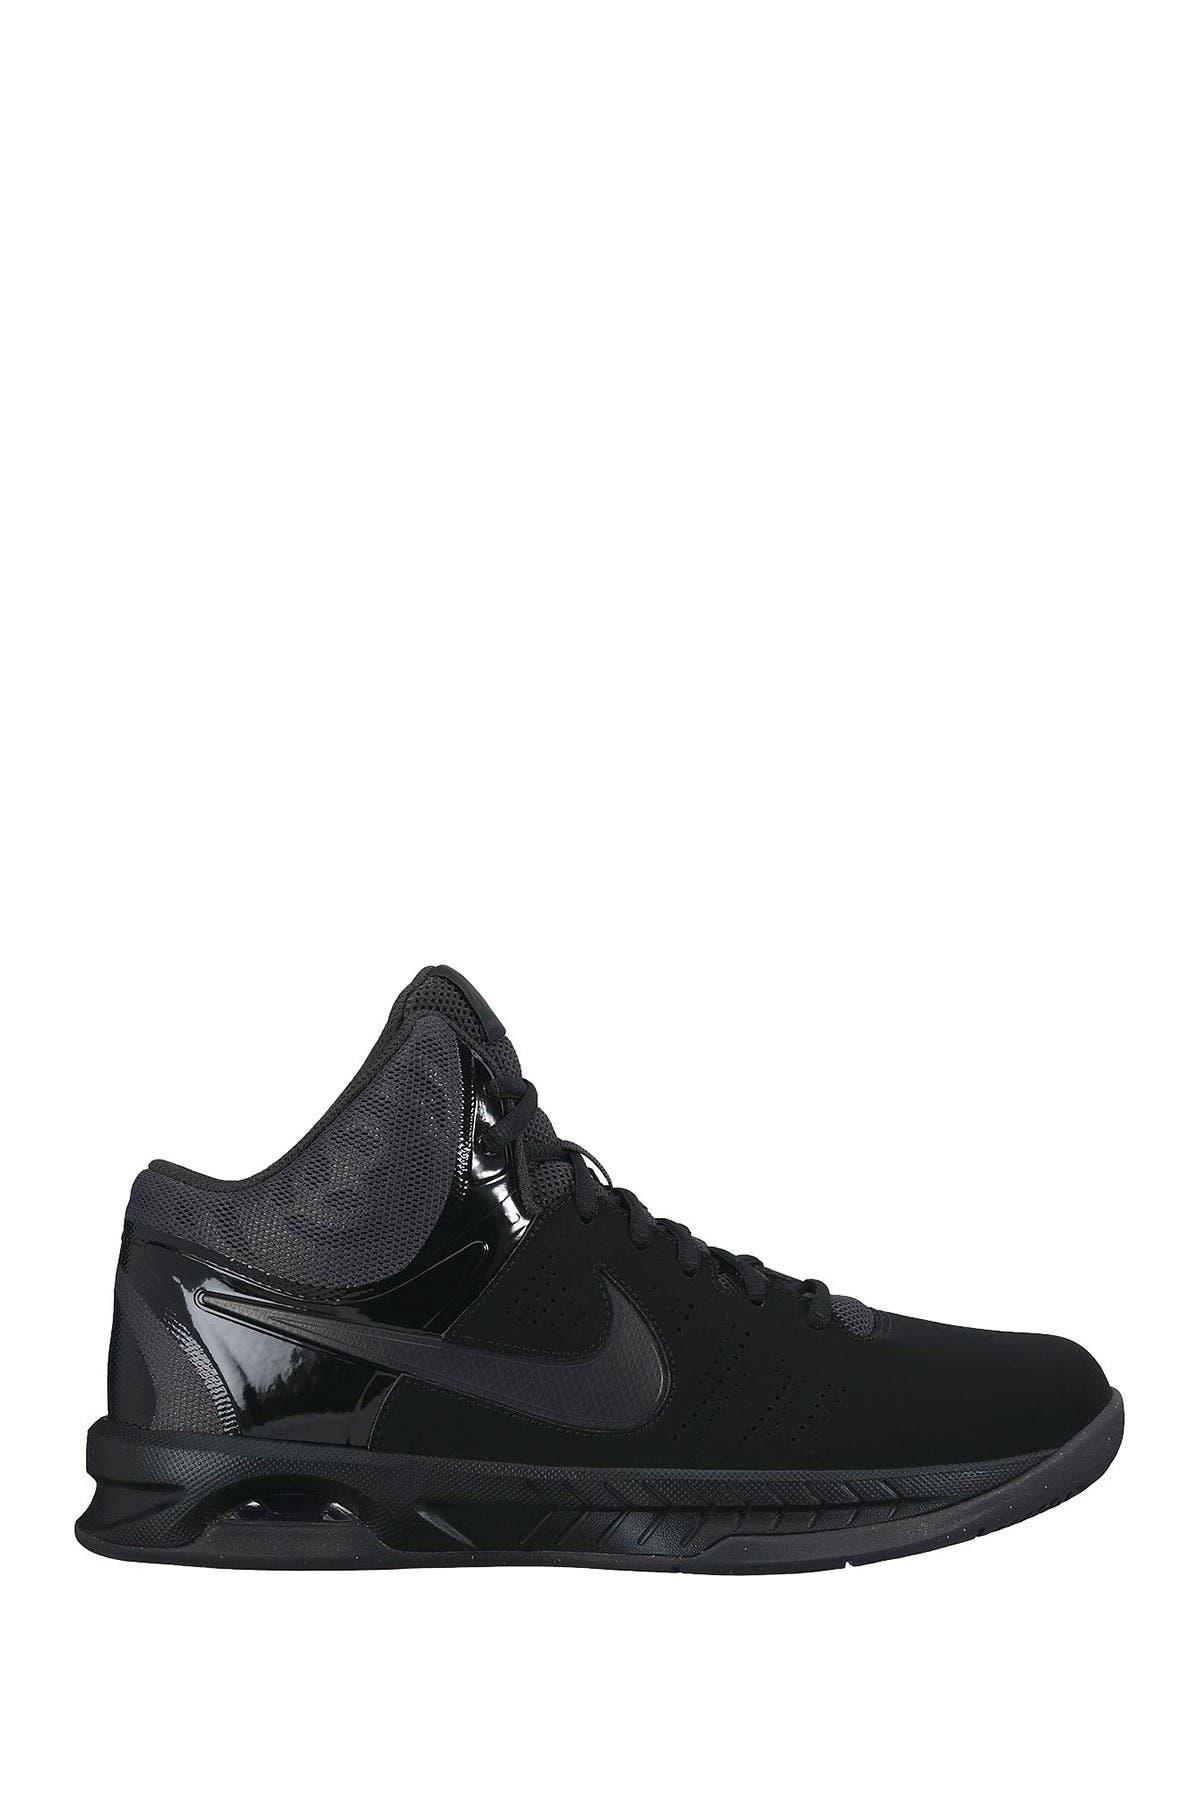 Nike   Air VISI Pro VI Basketball Shoe